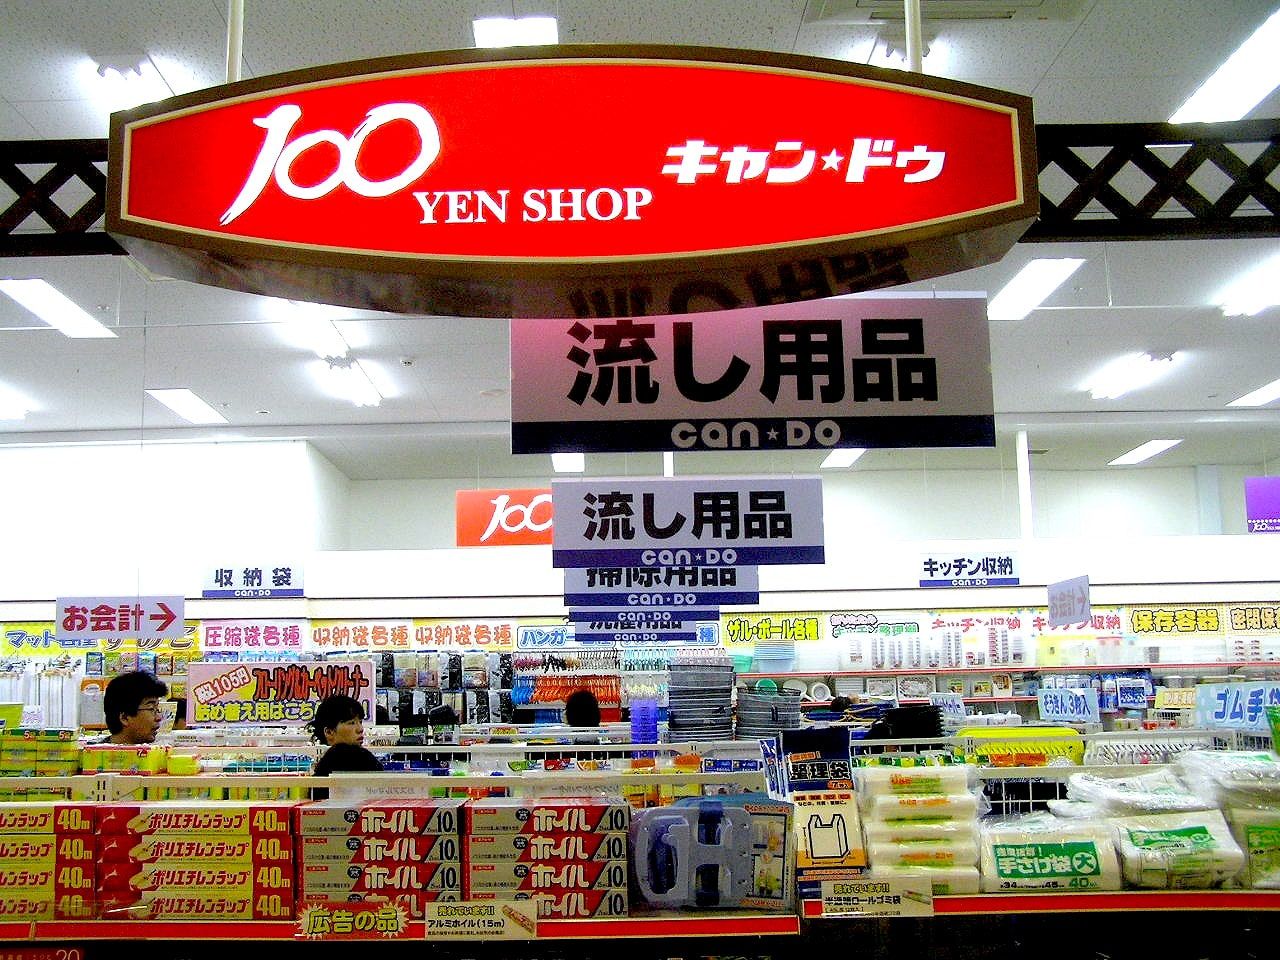 Hyaku Yen 100 Yen store in Yokohama best cities to visit in Japan